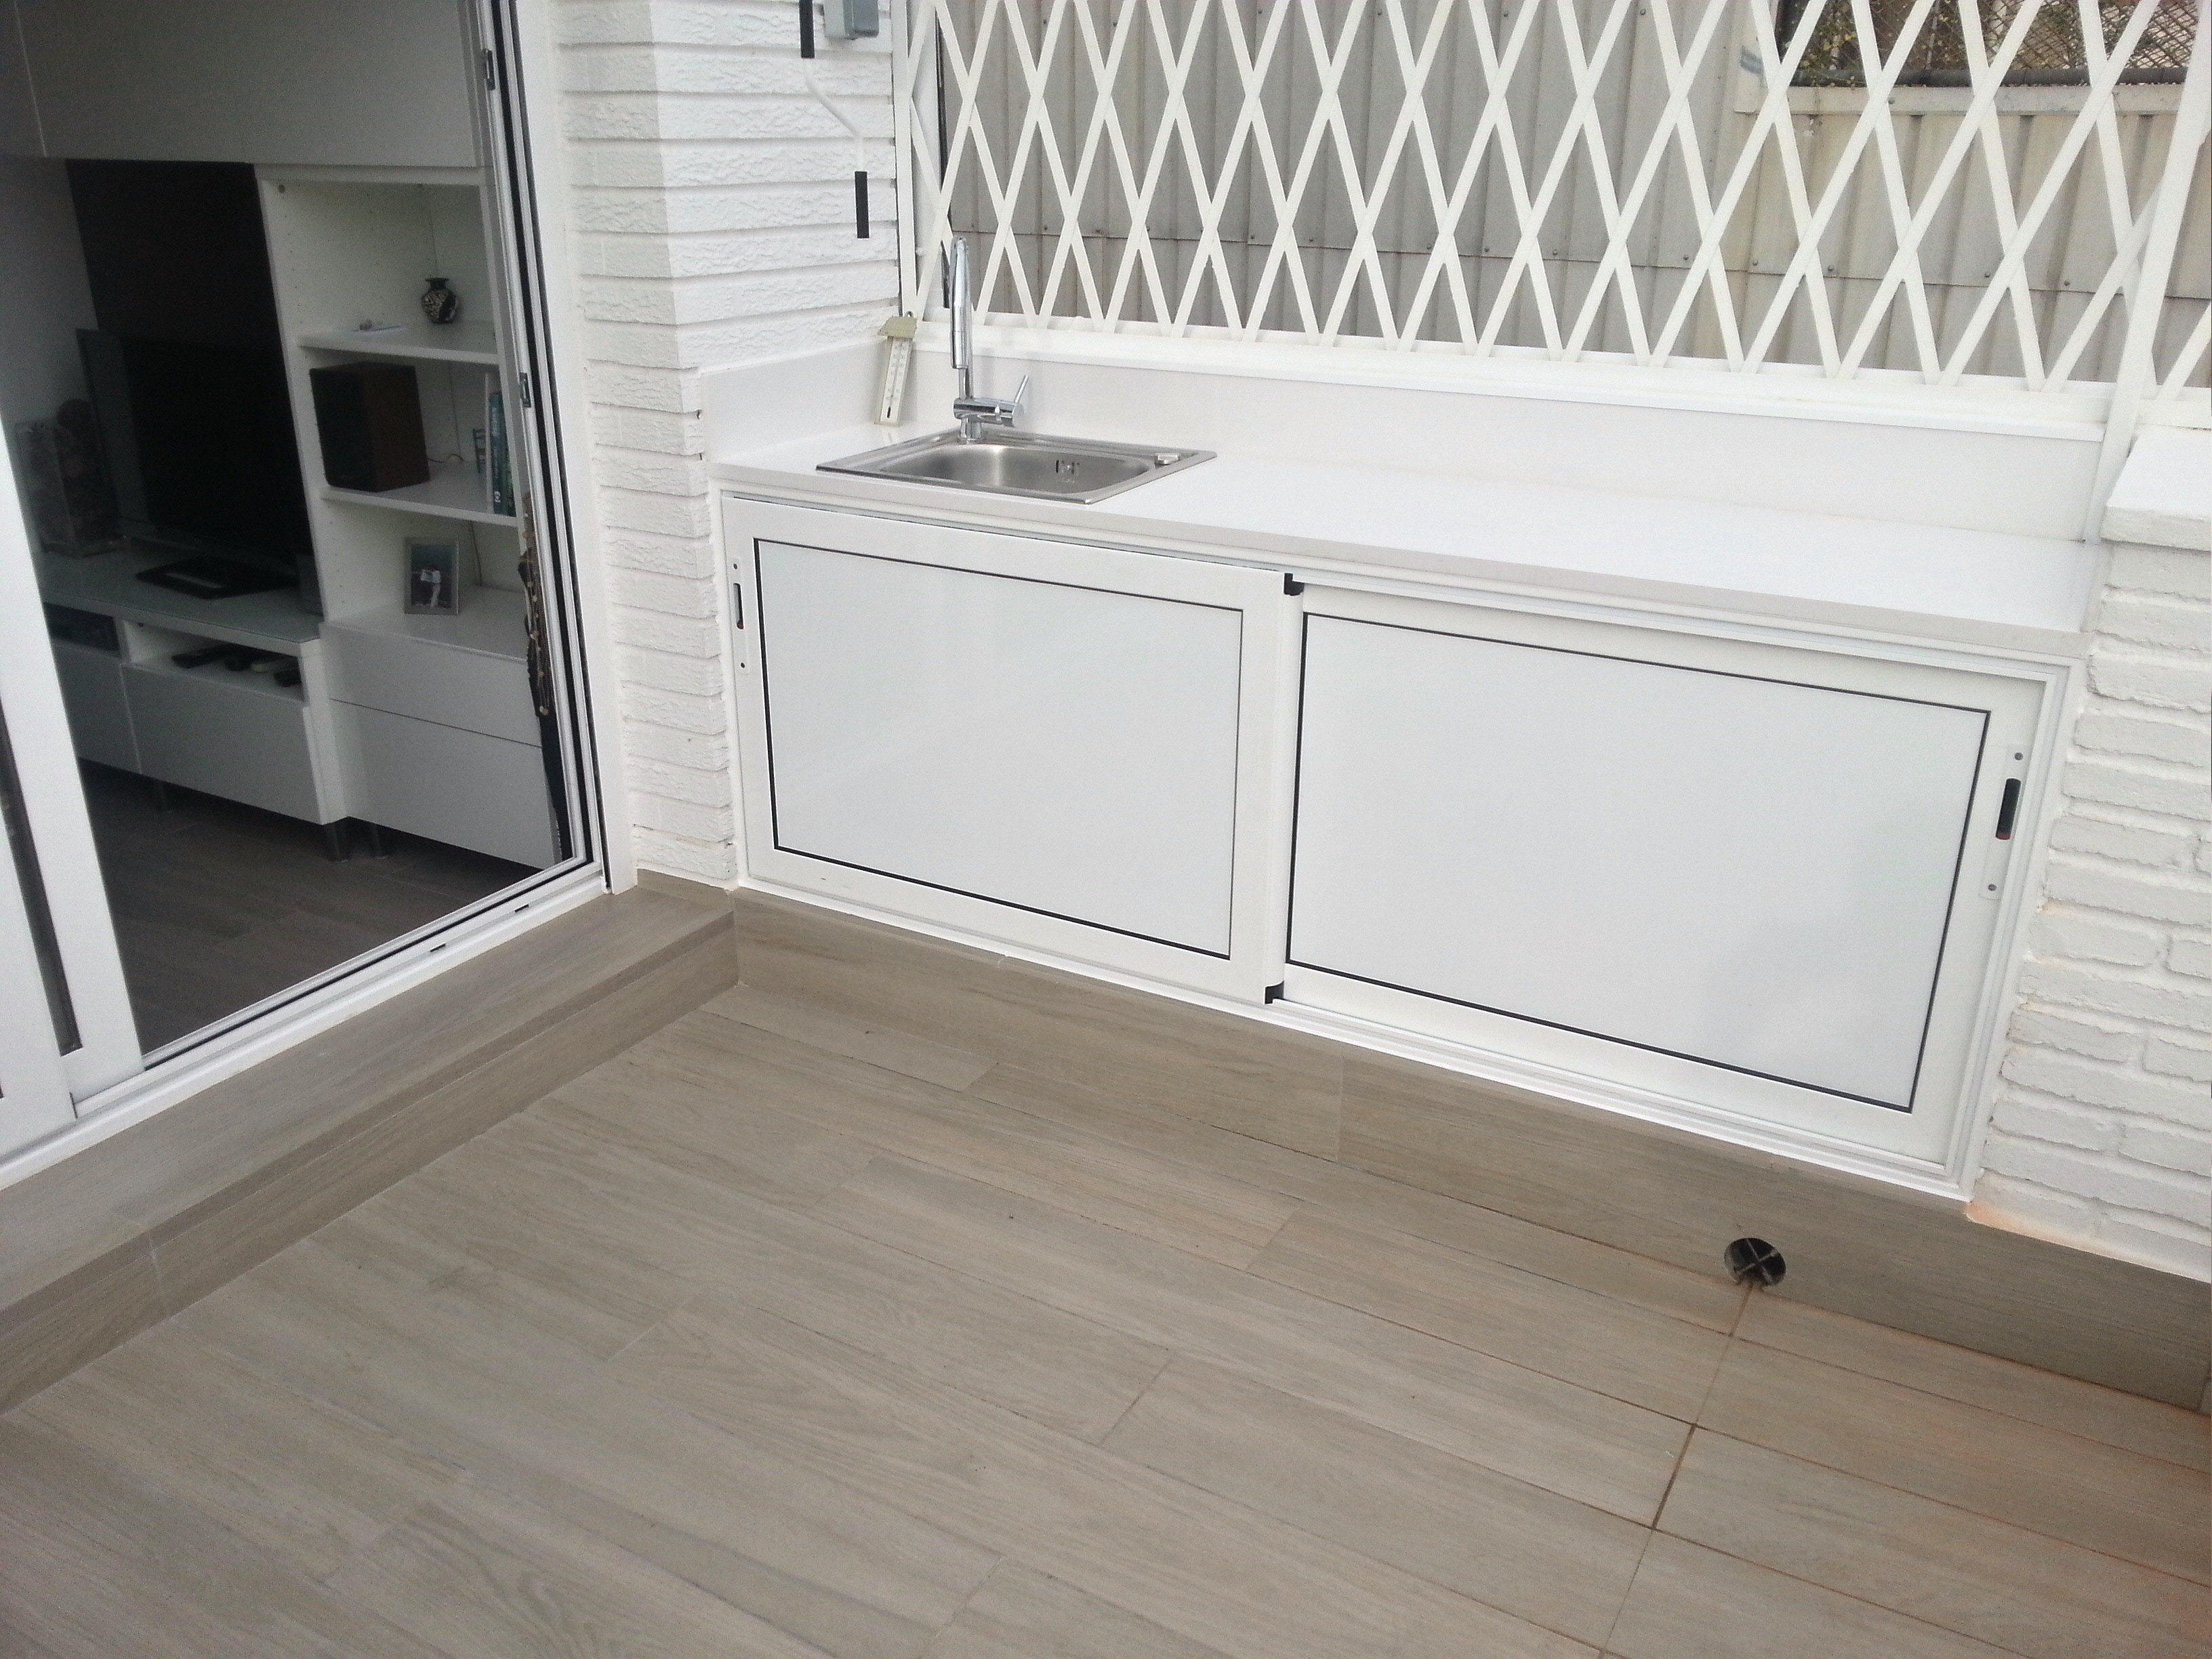 Venta otros productos de carpinter a de aluminio en for Mueble de aluminio exterior